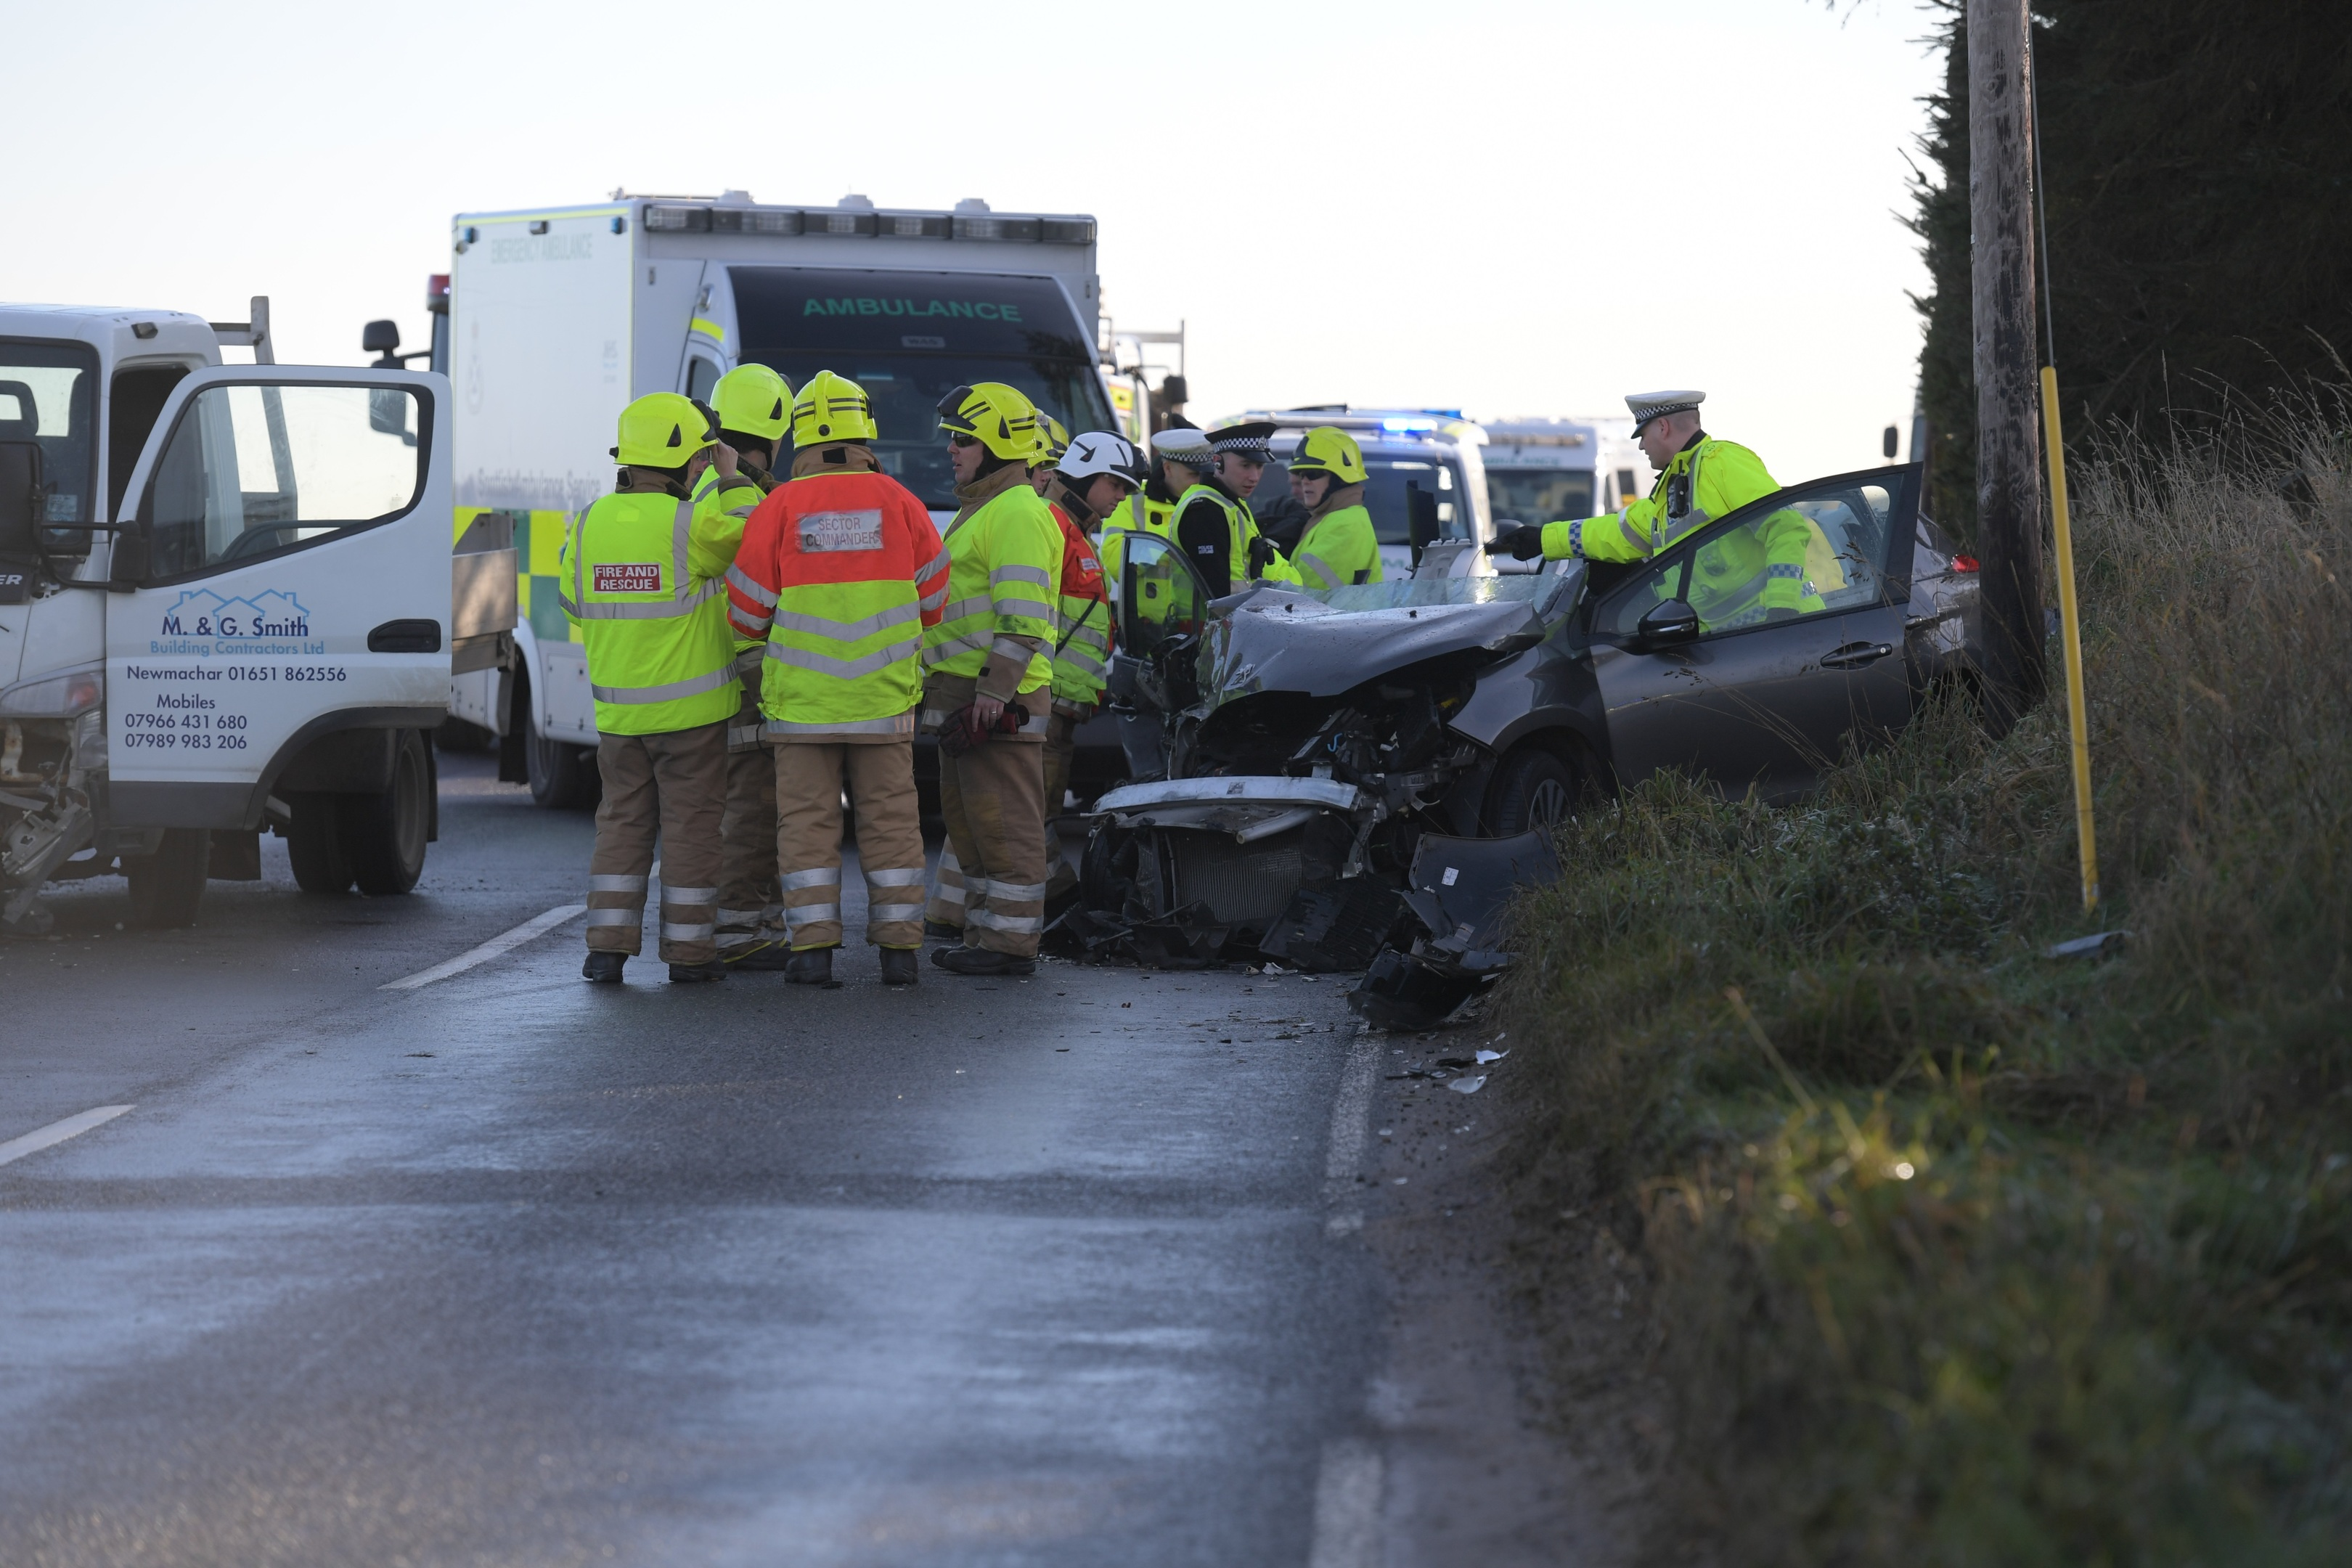 The crash at Potterton.